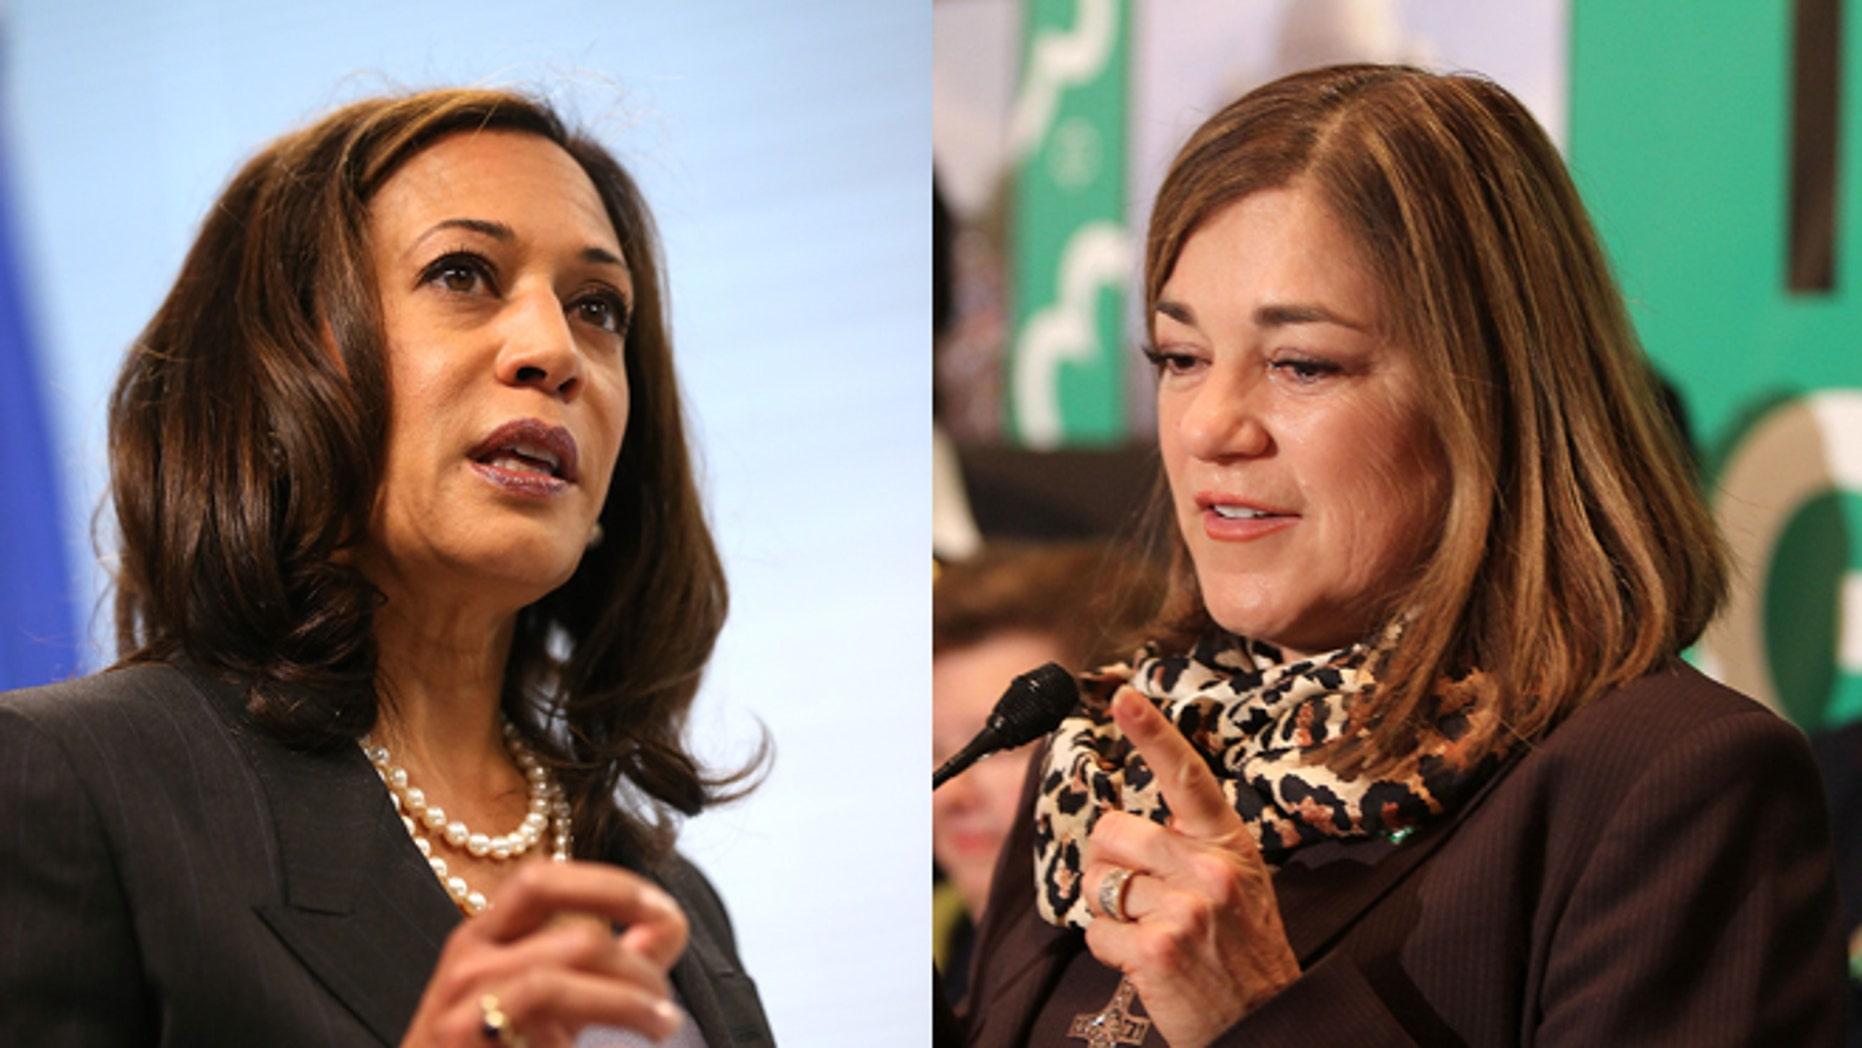 Kamala Harris (left) and Loretta Sanchez. (Photos: Getty Images)